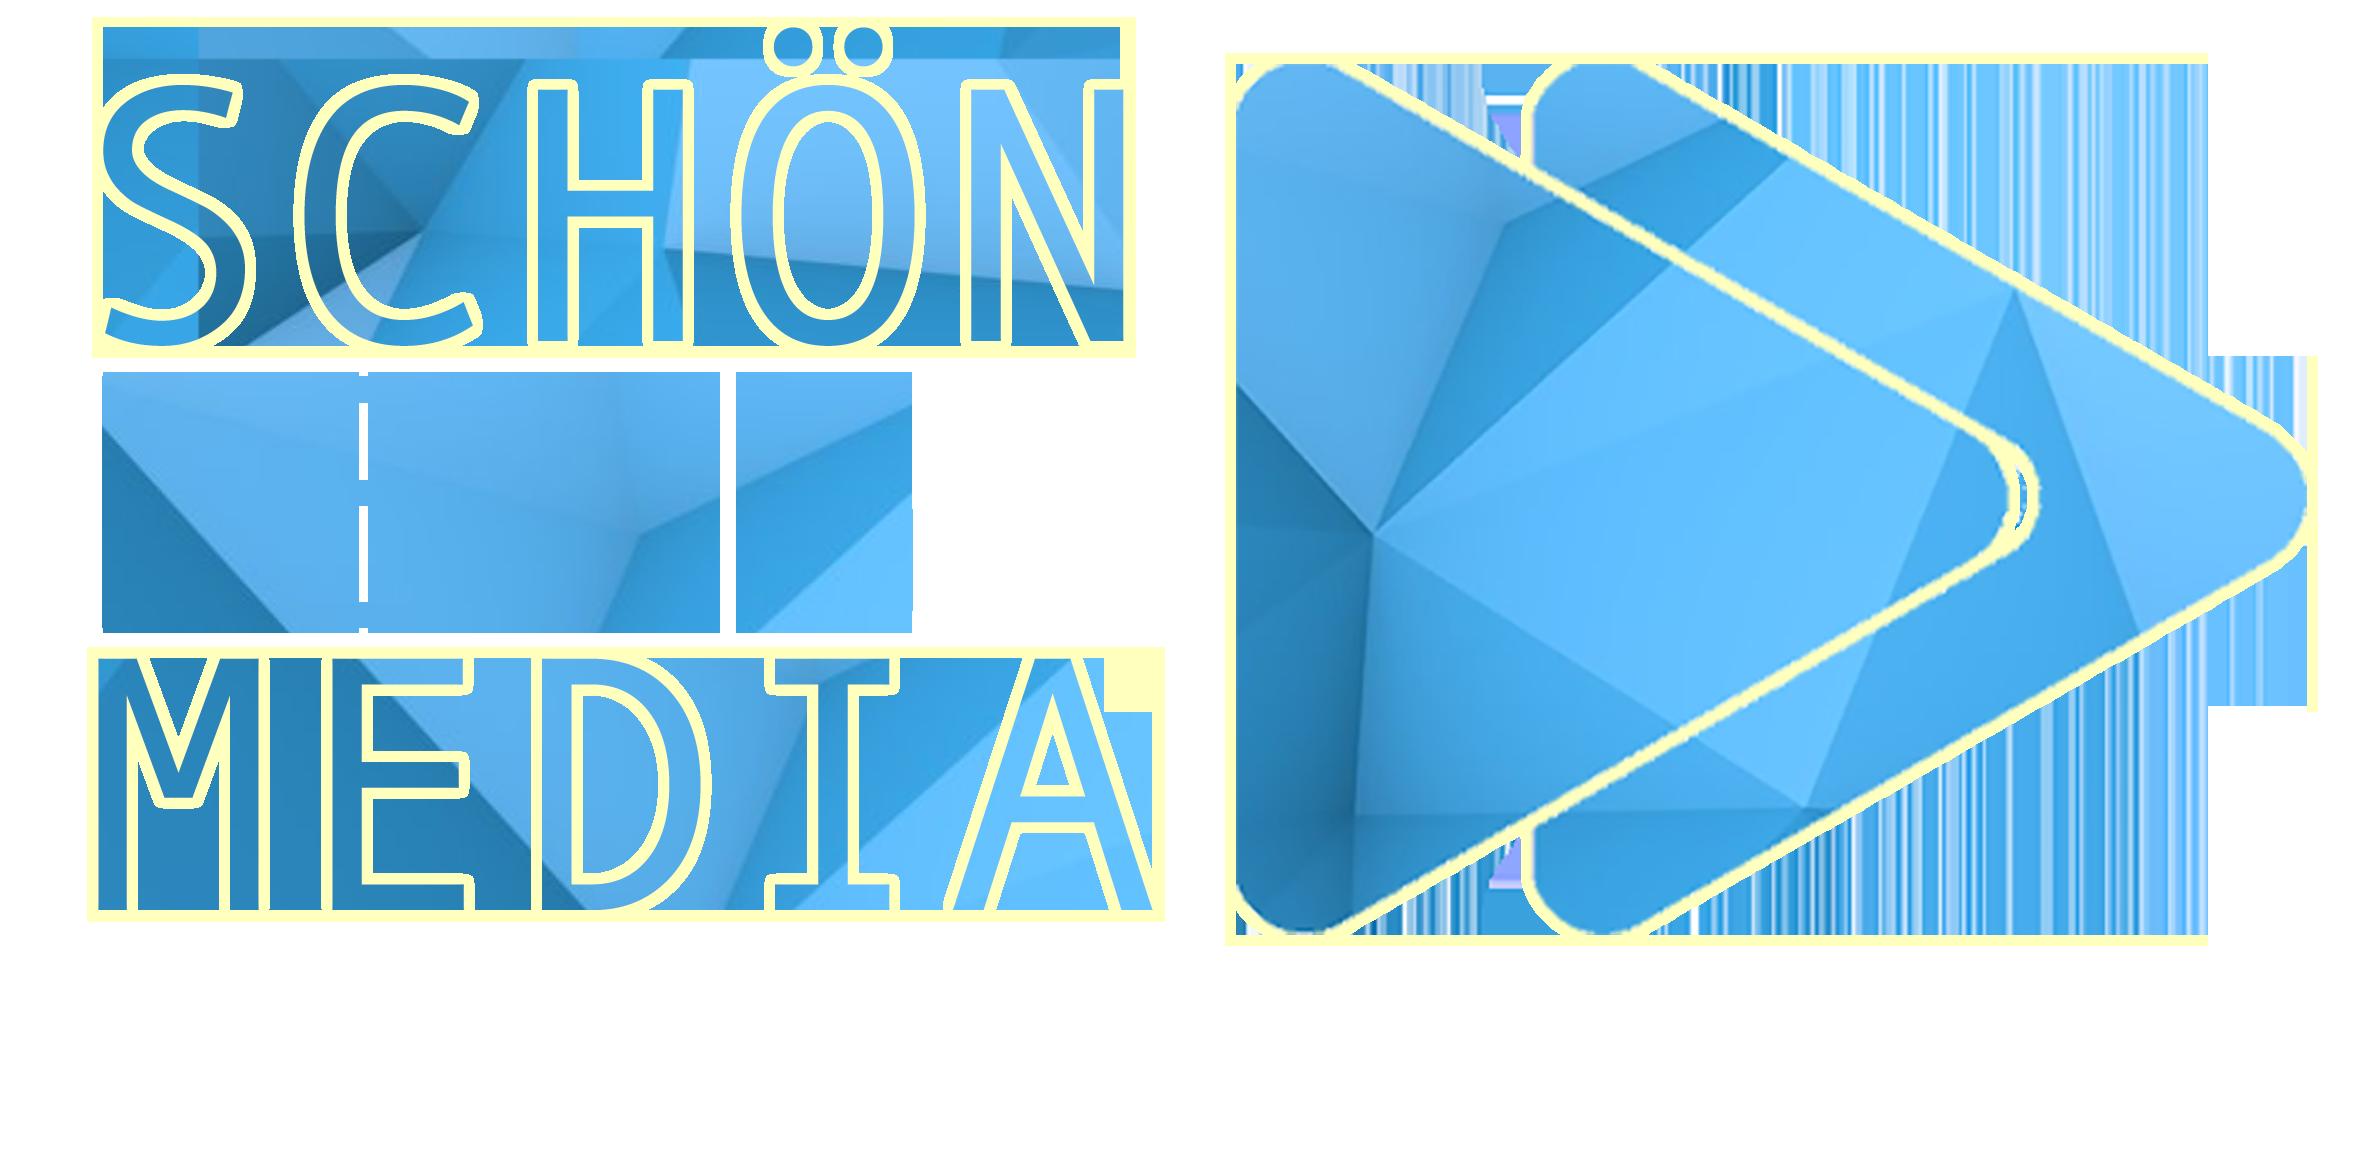 Schönberg Media